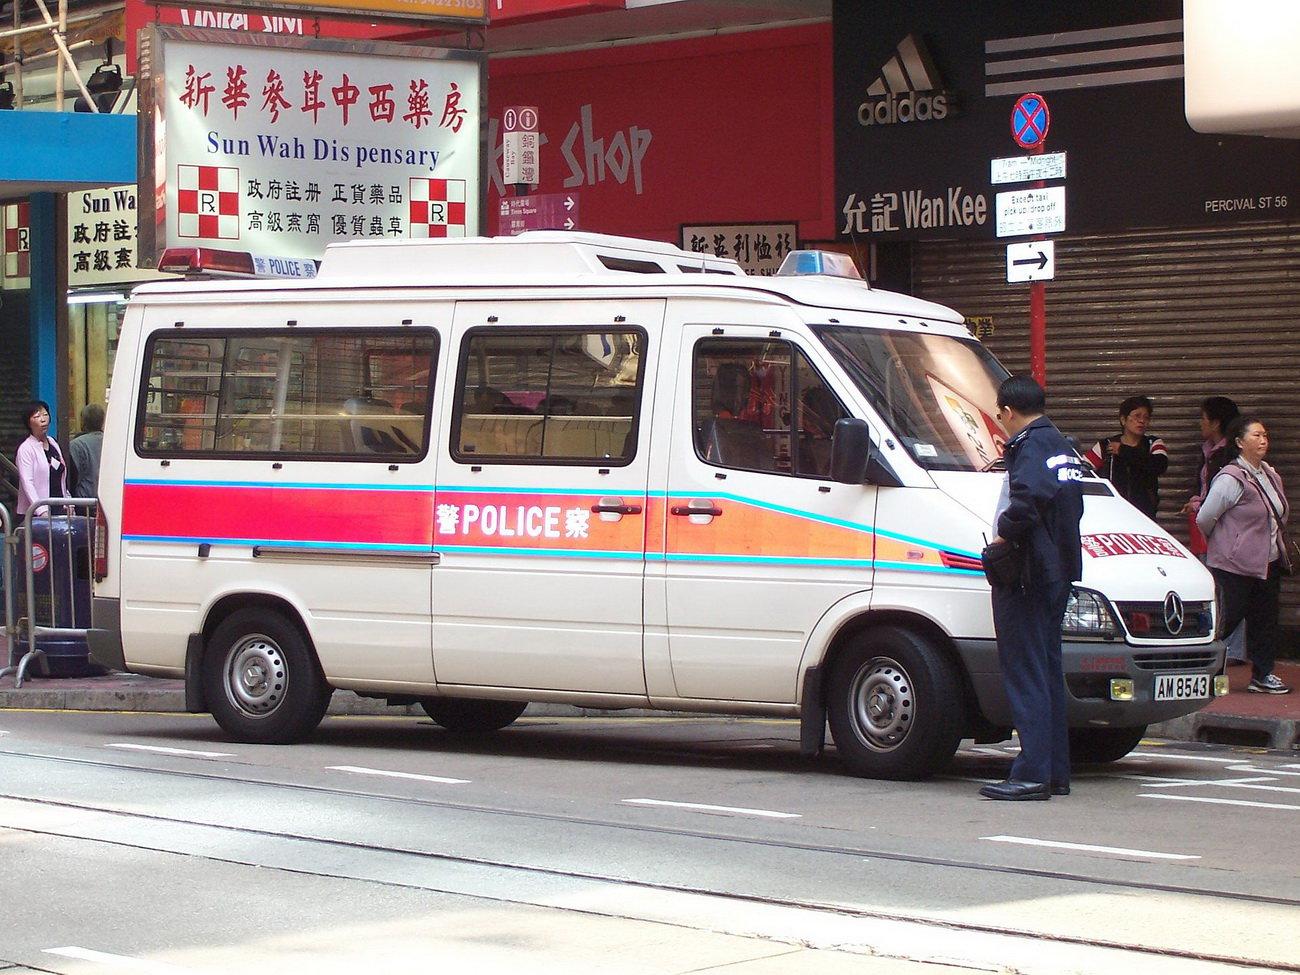 Čínská policie, ilustrační fotografie. Autor: Hamedog